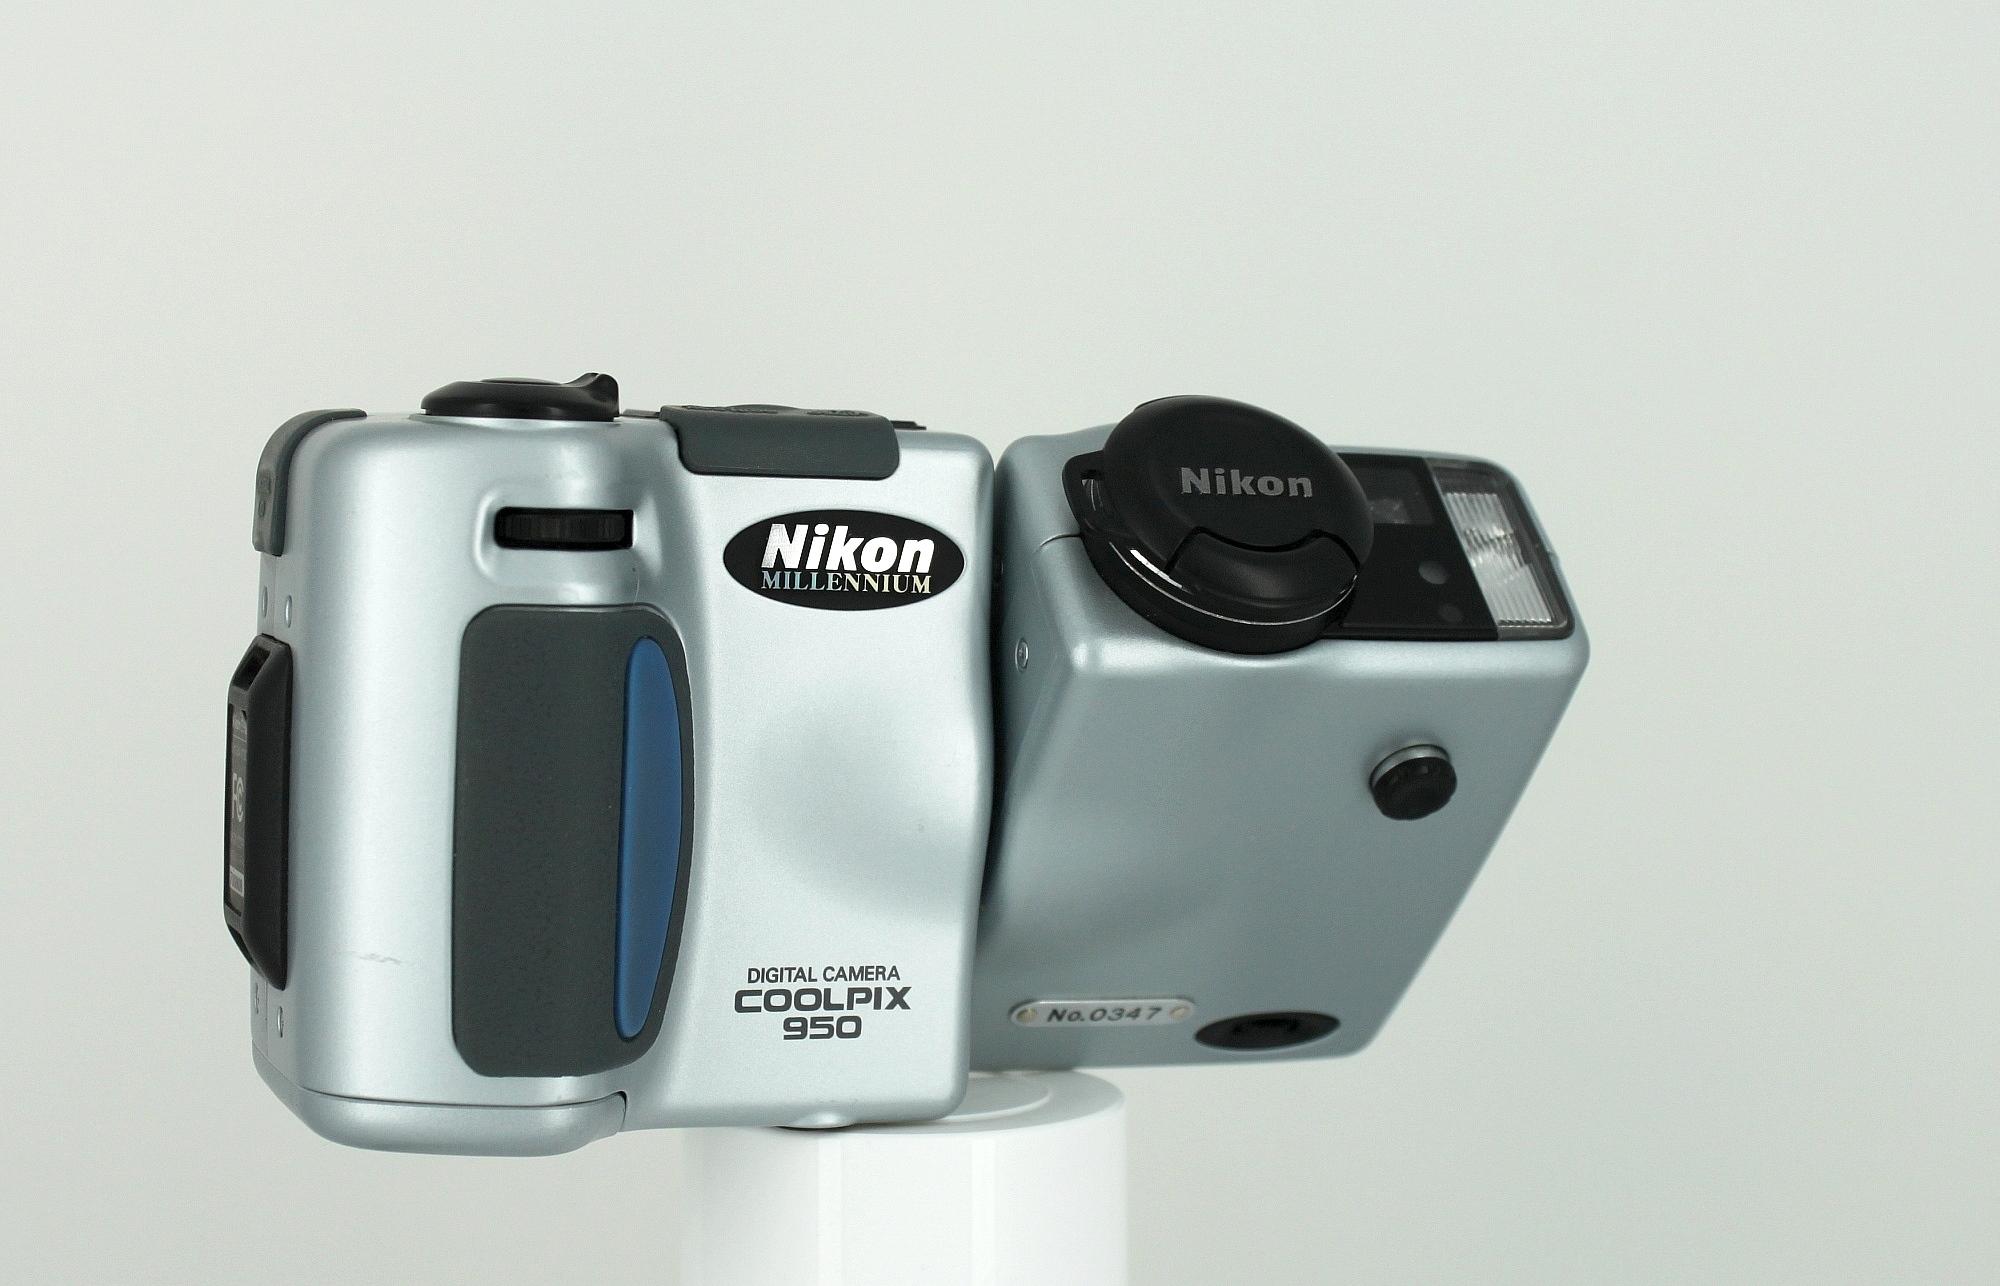 Nikon Coolpix 950 Millennium Edition (1999)